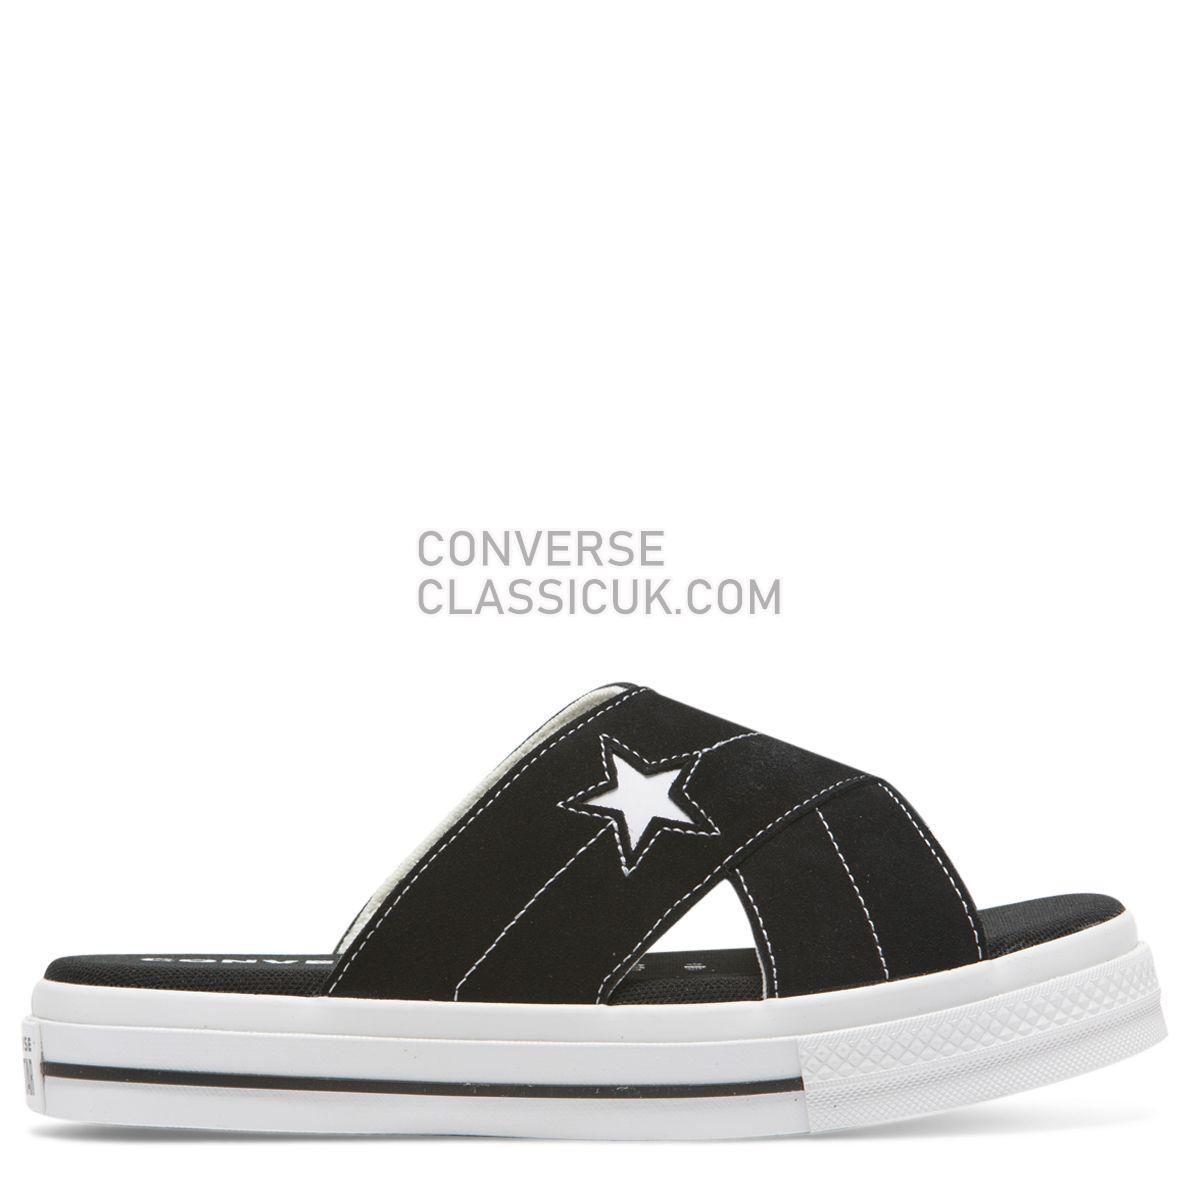 Converse One Star Sandal Slip Black/Egret Womens 564143 Black/Egret/White Shoes